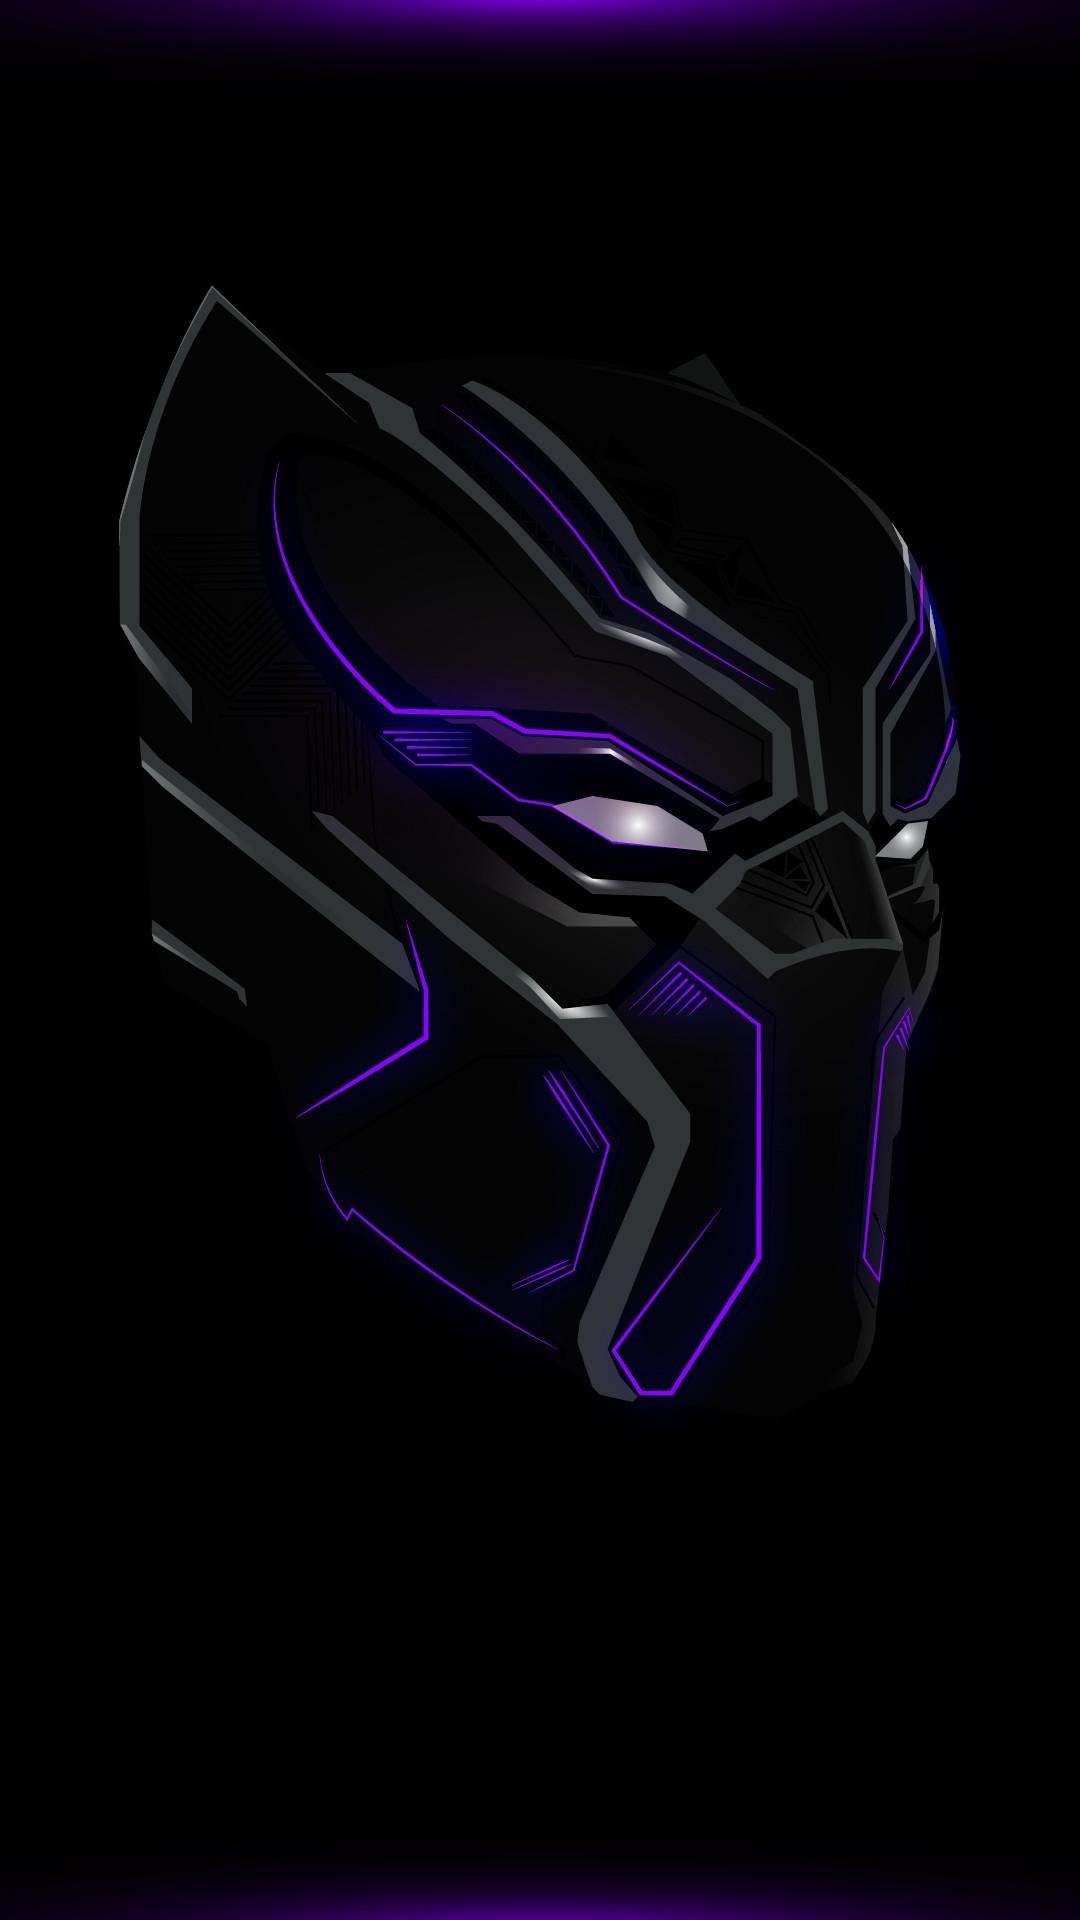 Black Panther 2 Suit iPhone Wallpaper